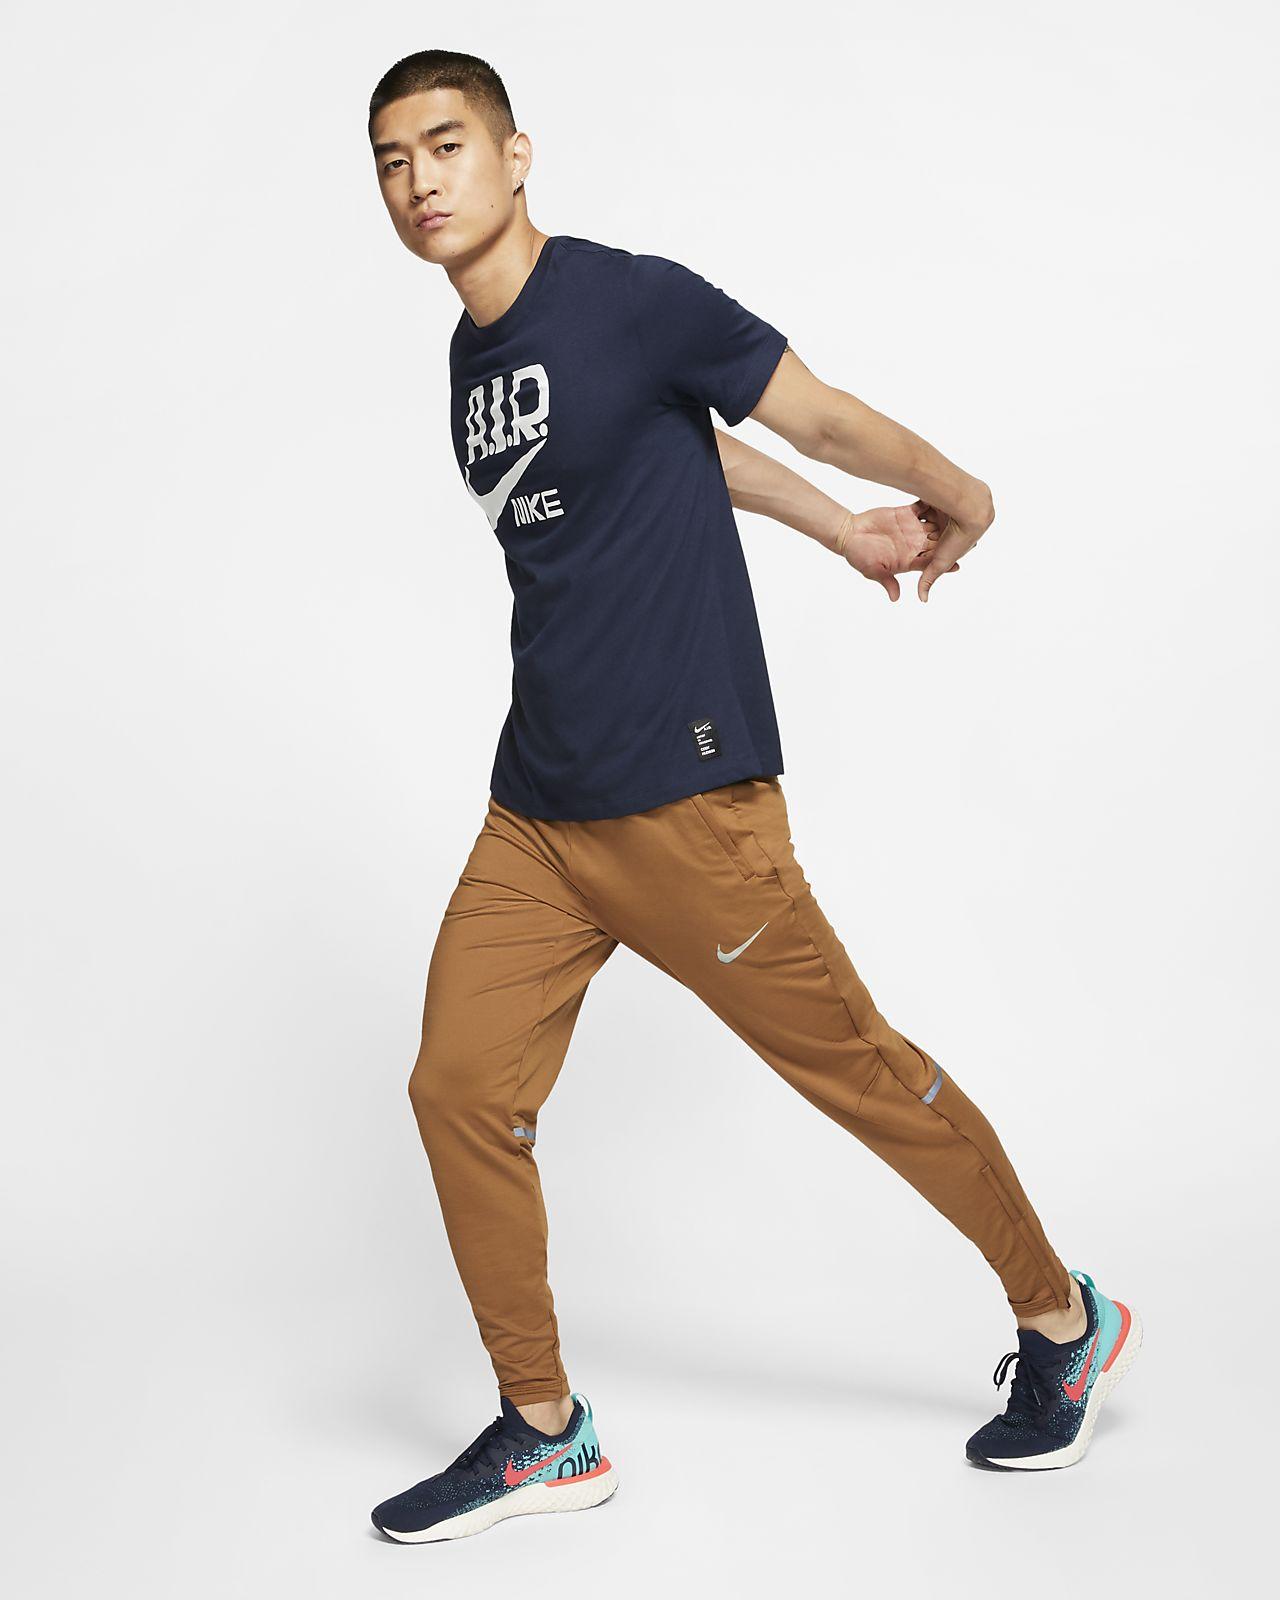 Nike Dri FIT A.I.R. Cody Hudson Lauf T Shirt für Herren